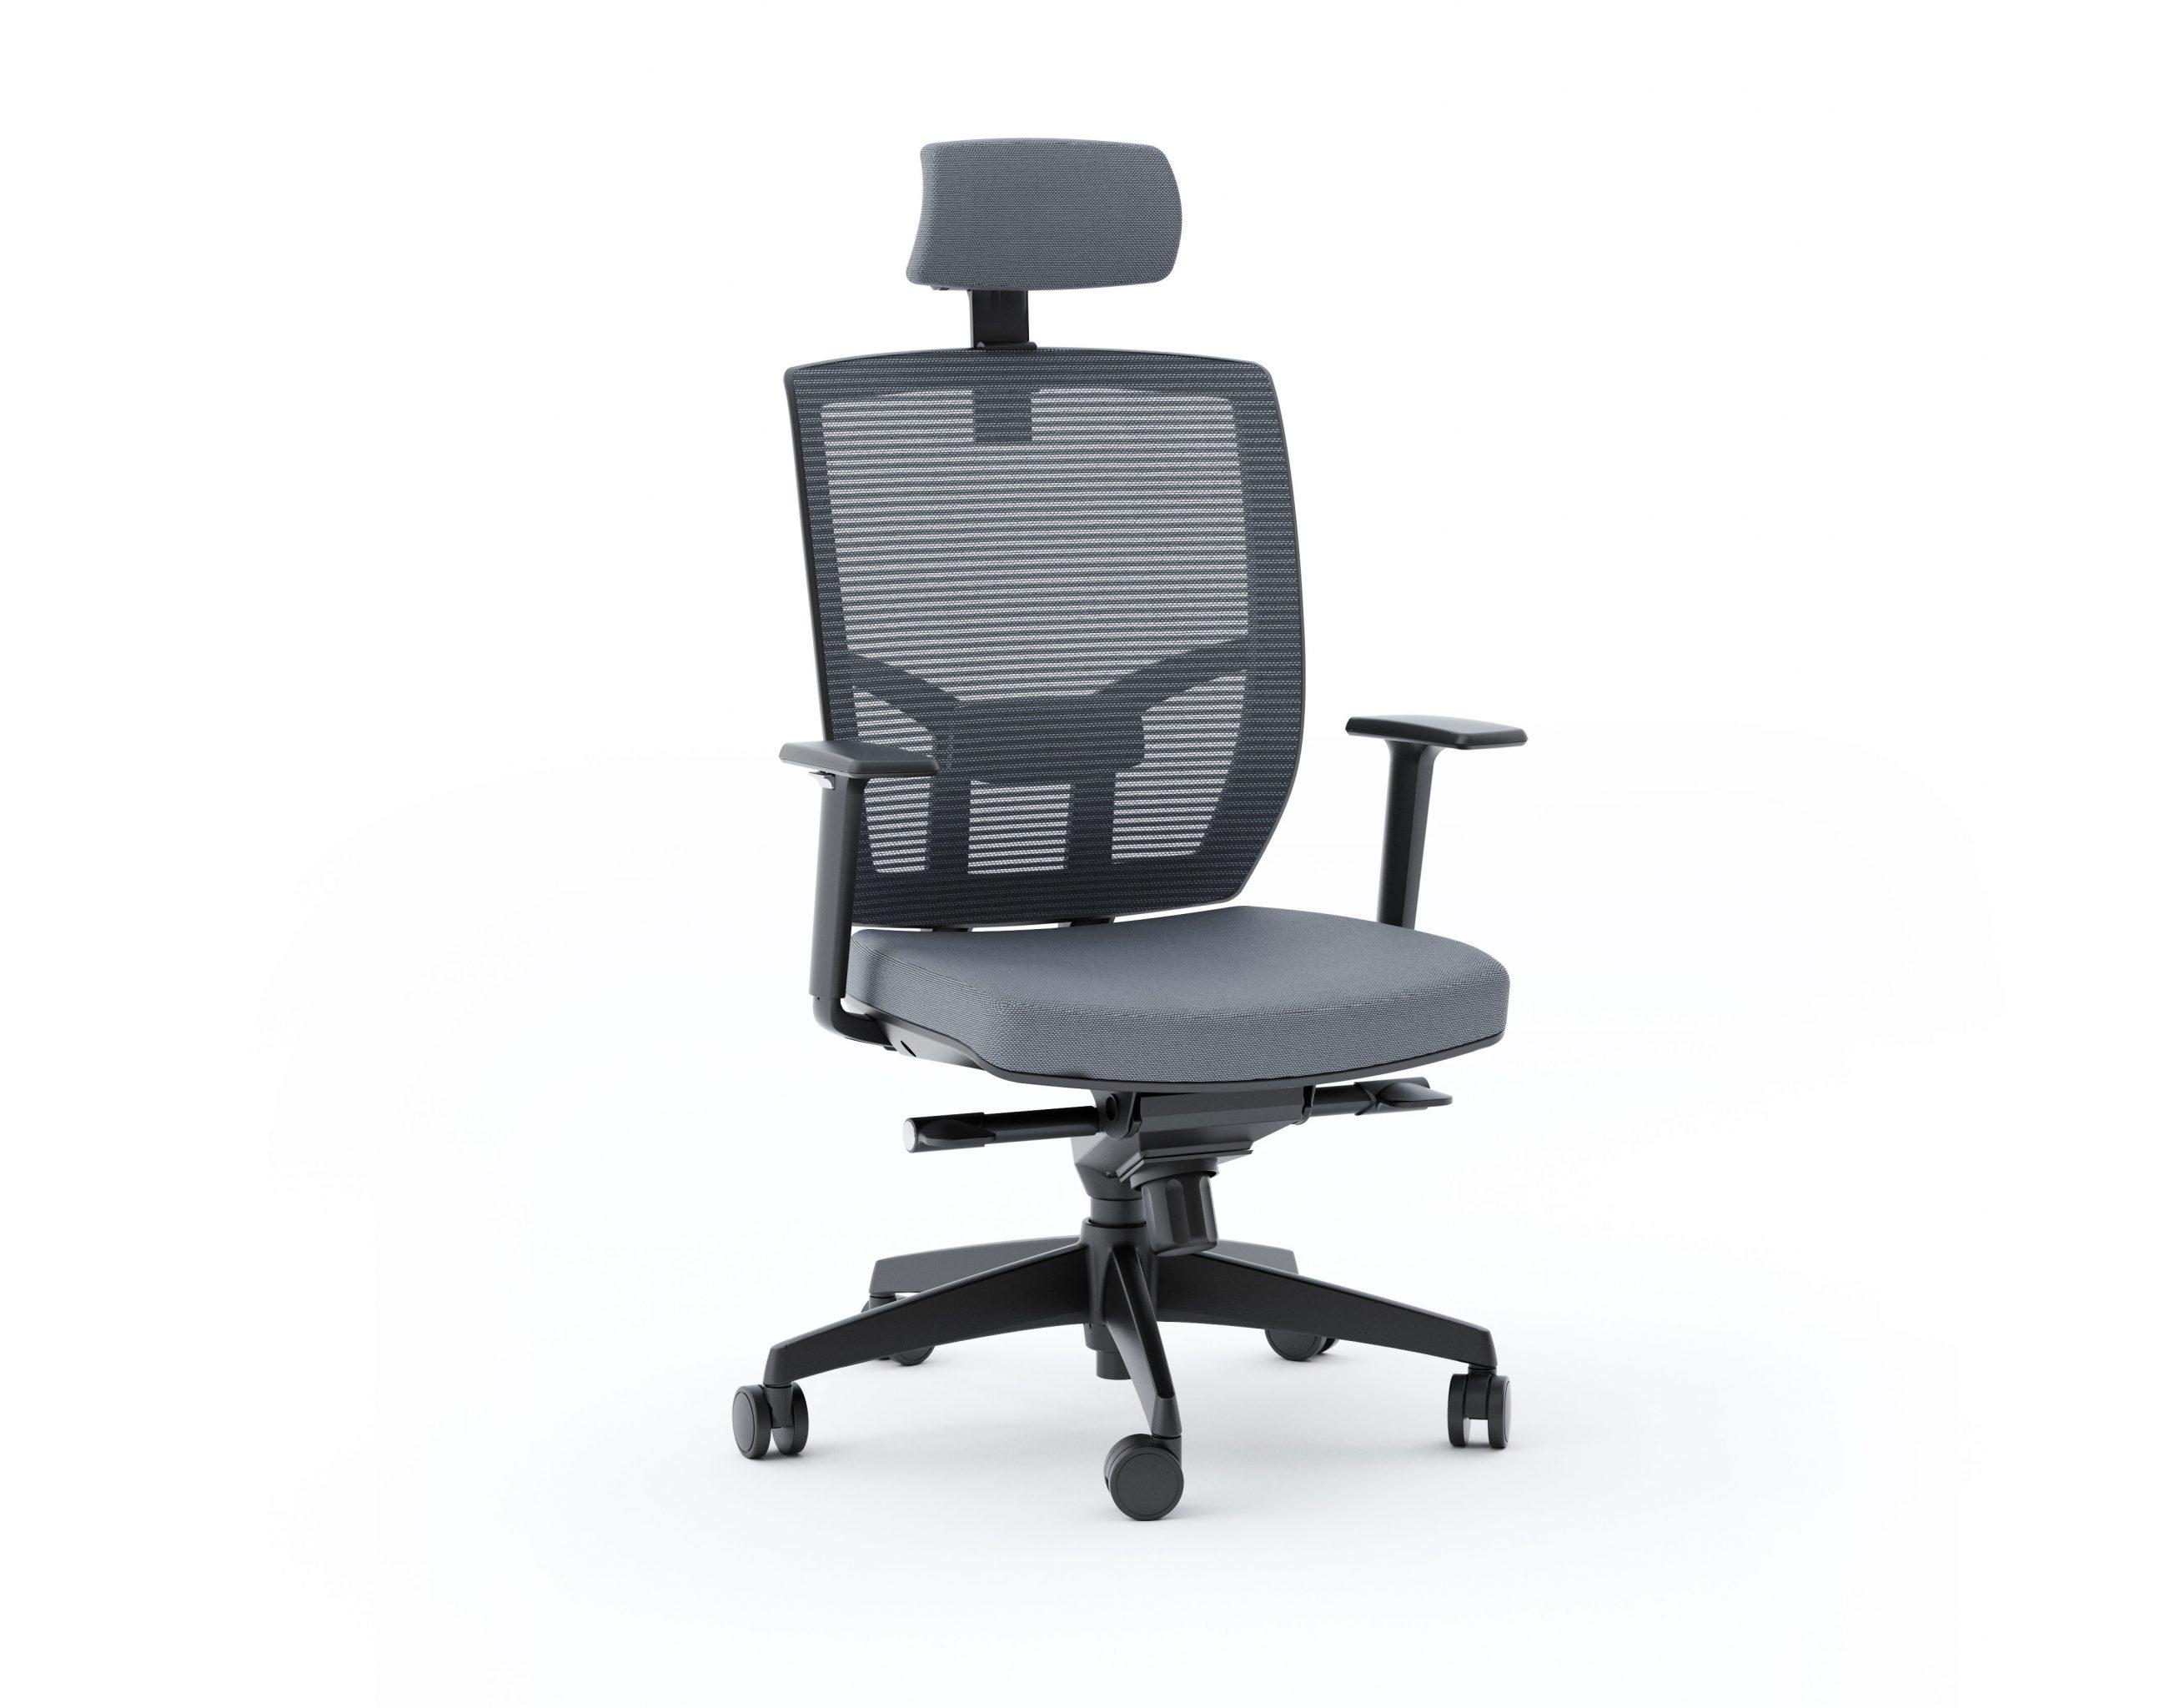 tc-223-office-chair-bdi-223dhf-gray-1